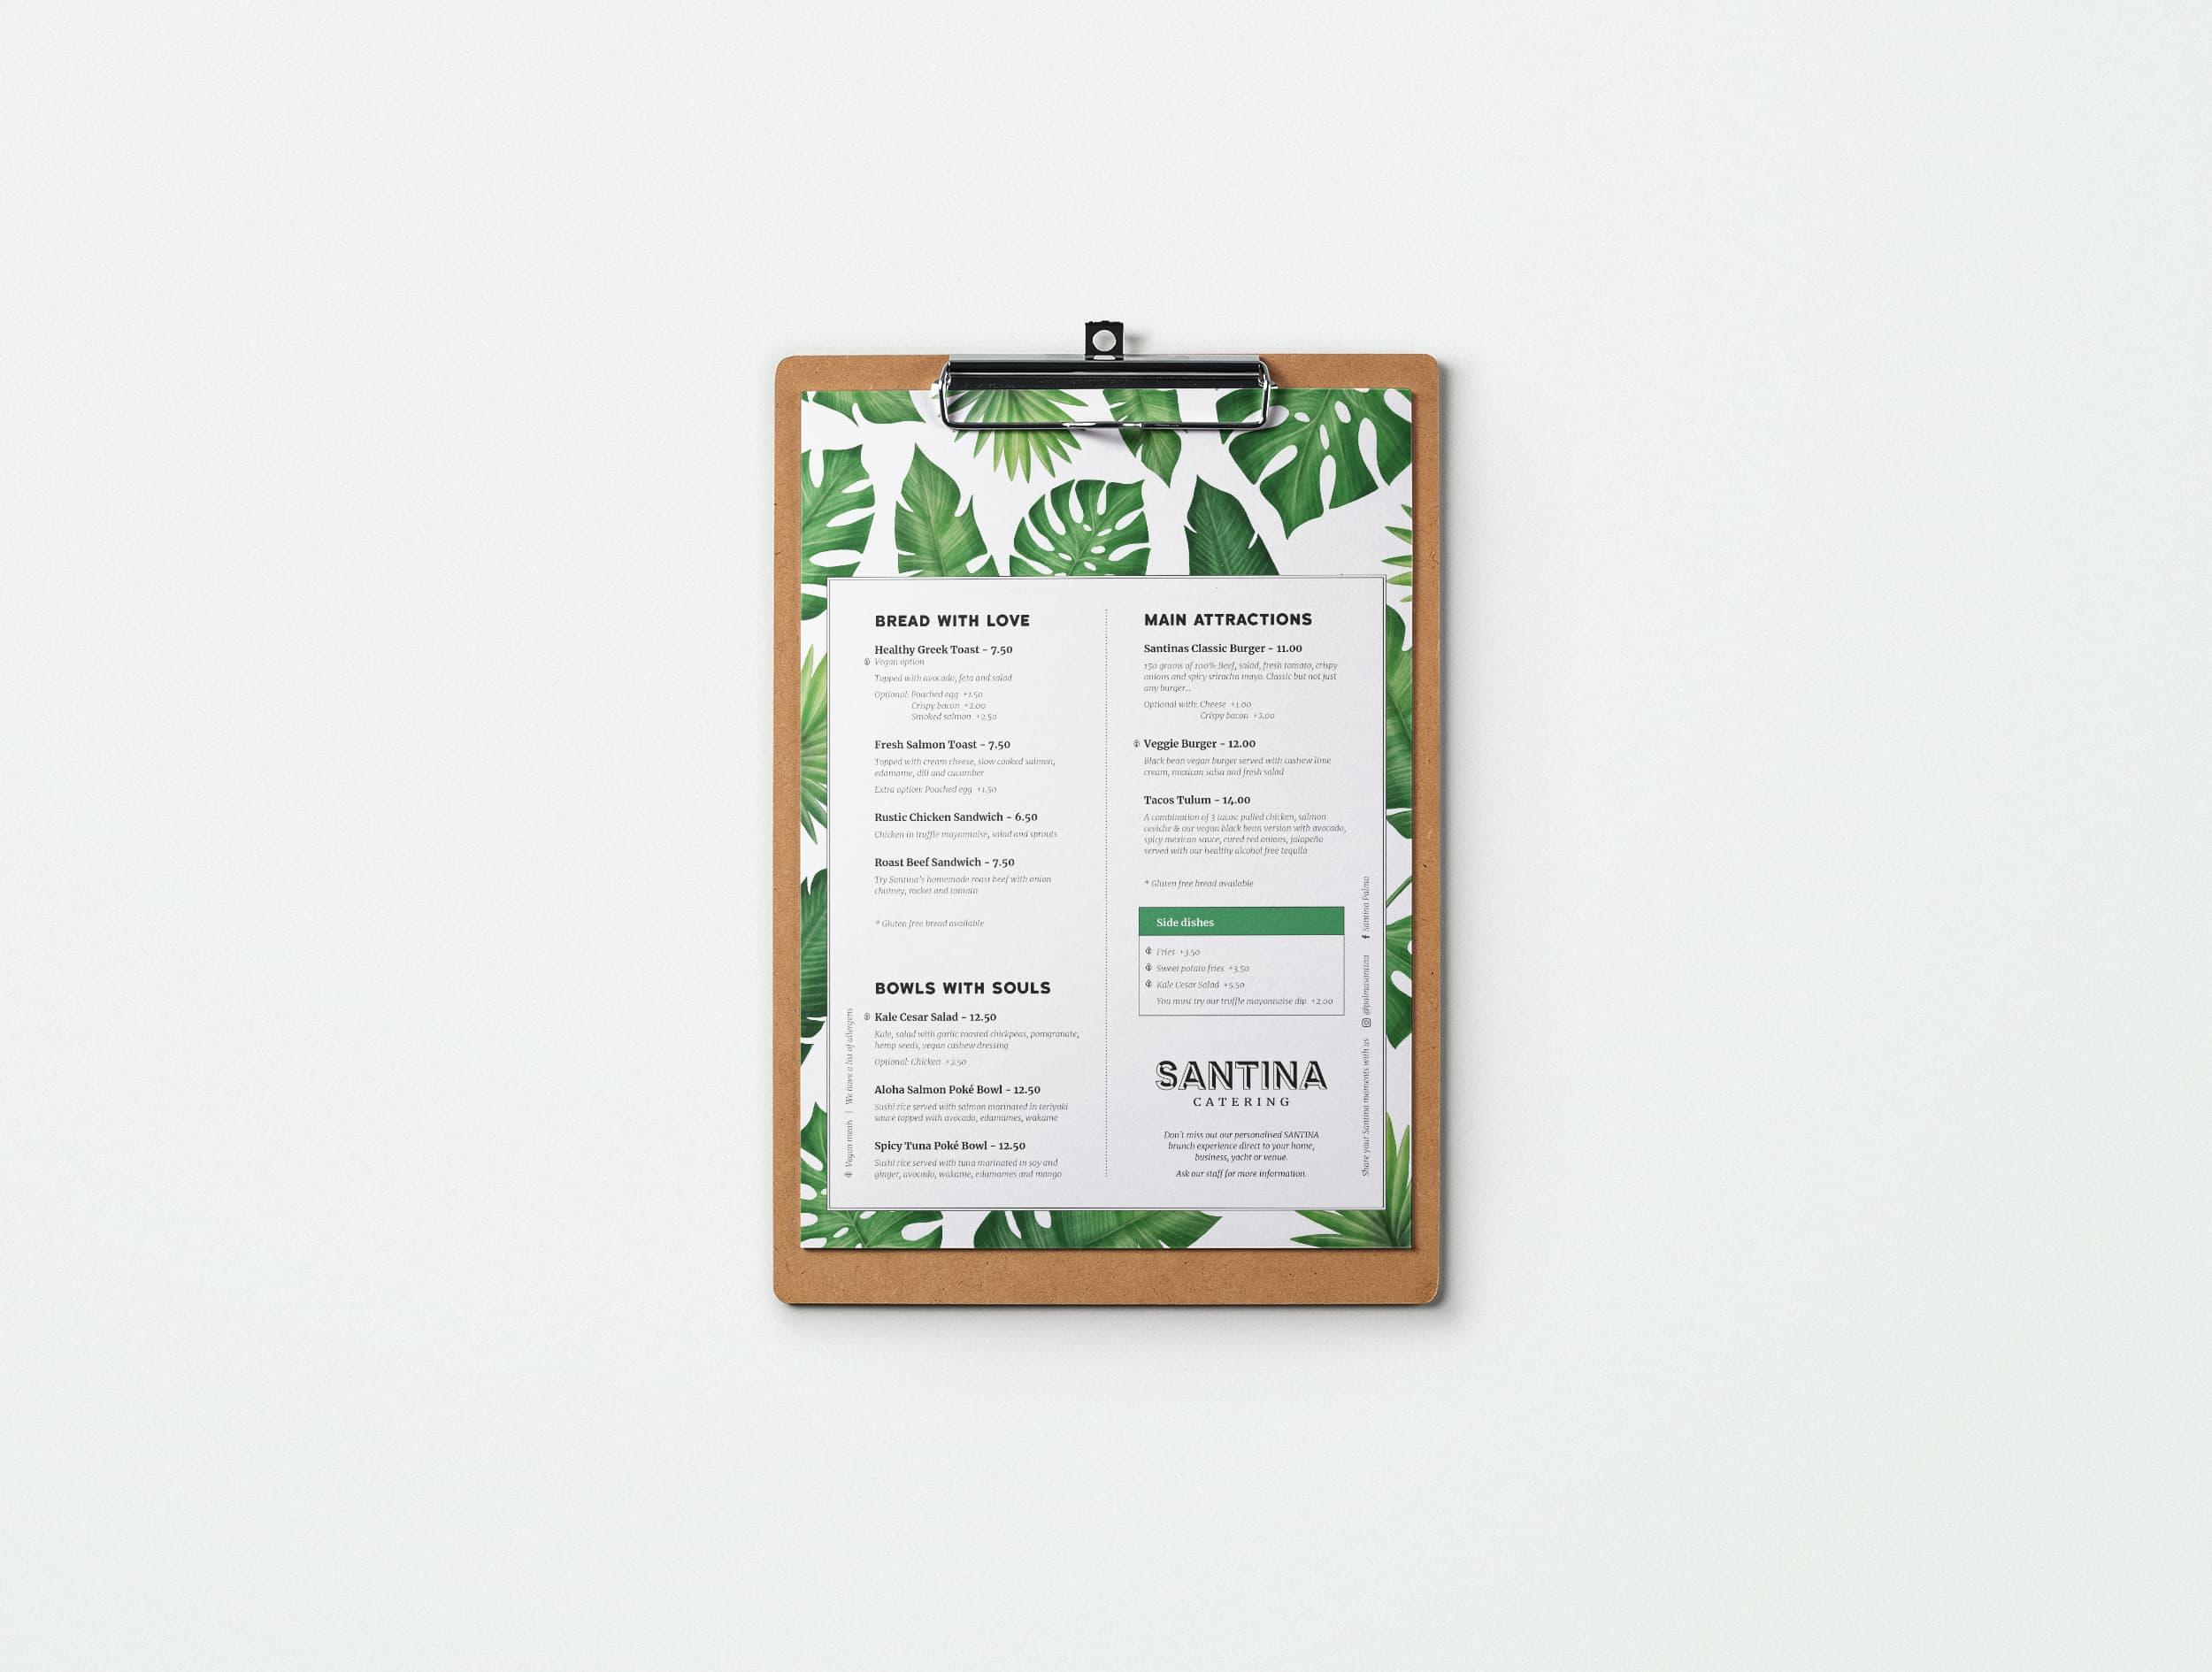 Diseño Carta Restaurante Brunch Santina en Mallorca - Àncar Studio